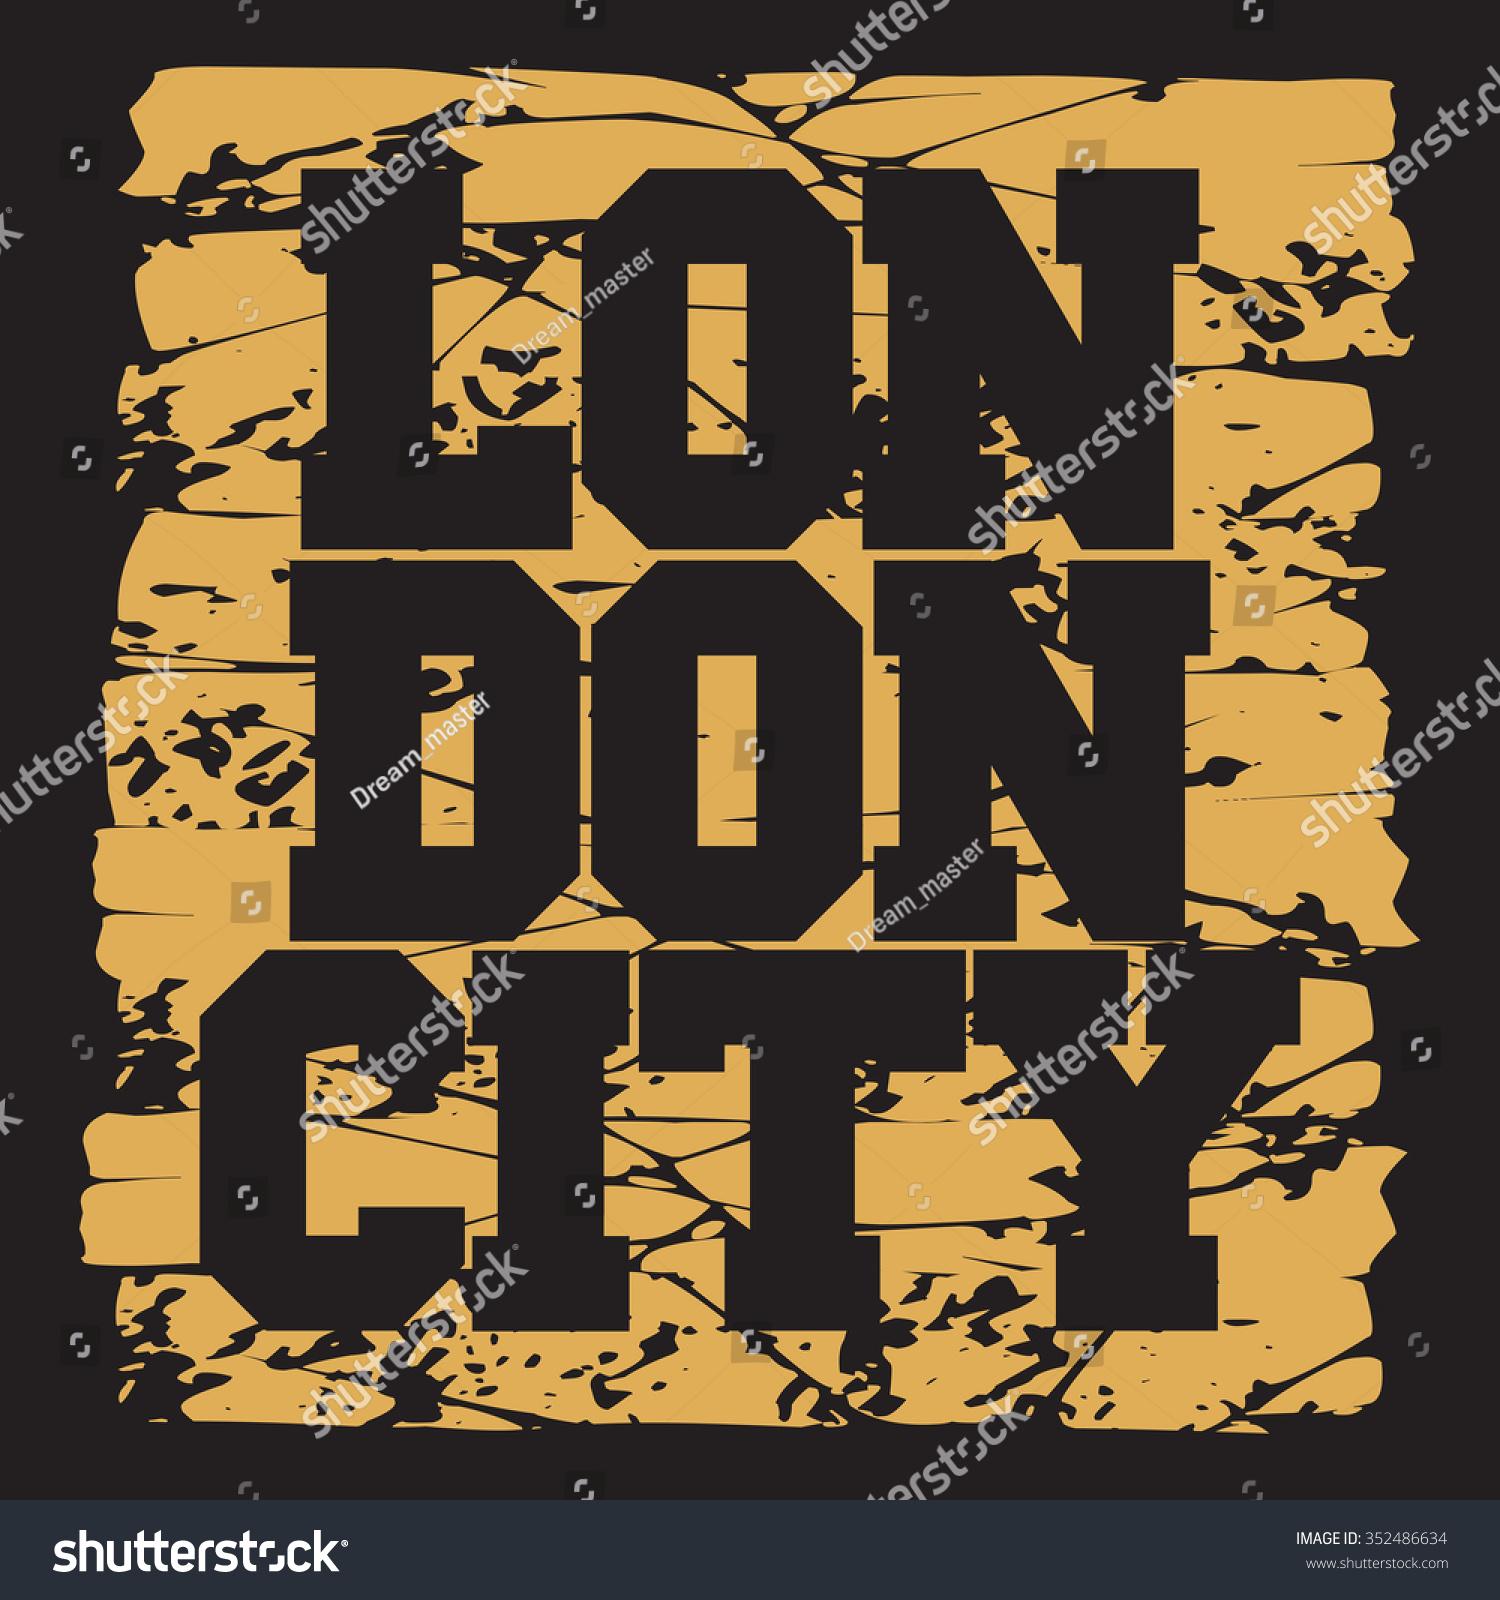 Shirt design london - T Shirt London Design Fashion Typography Graphics Stylish Printing Design